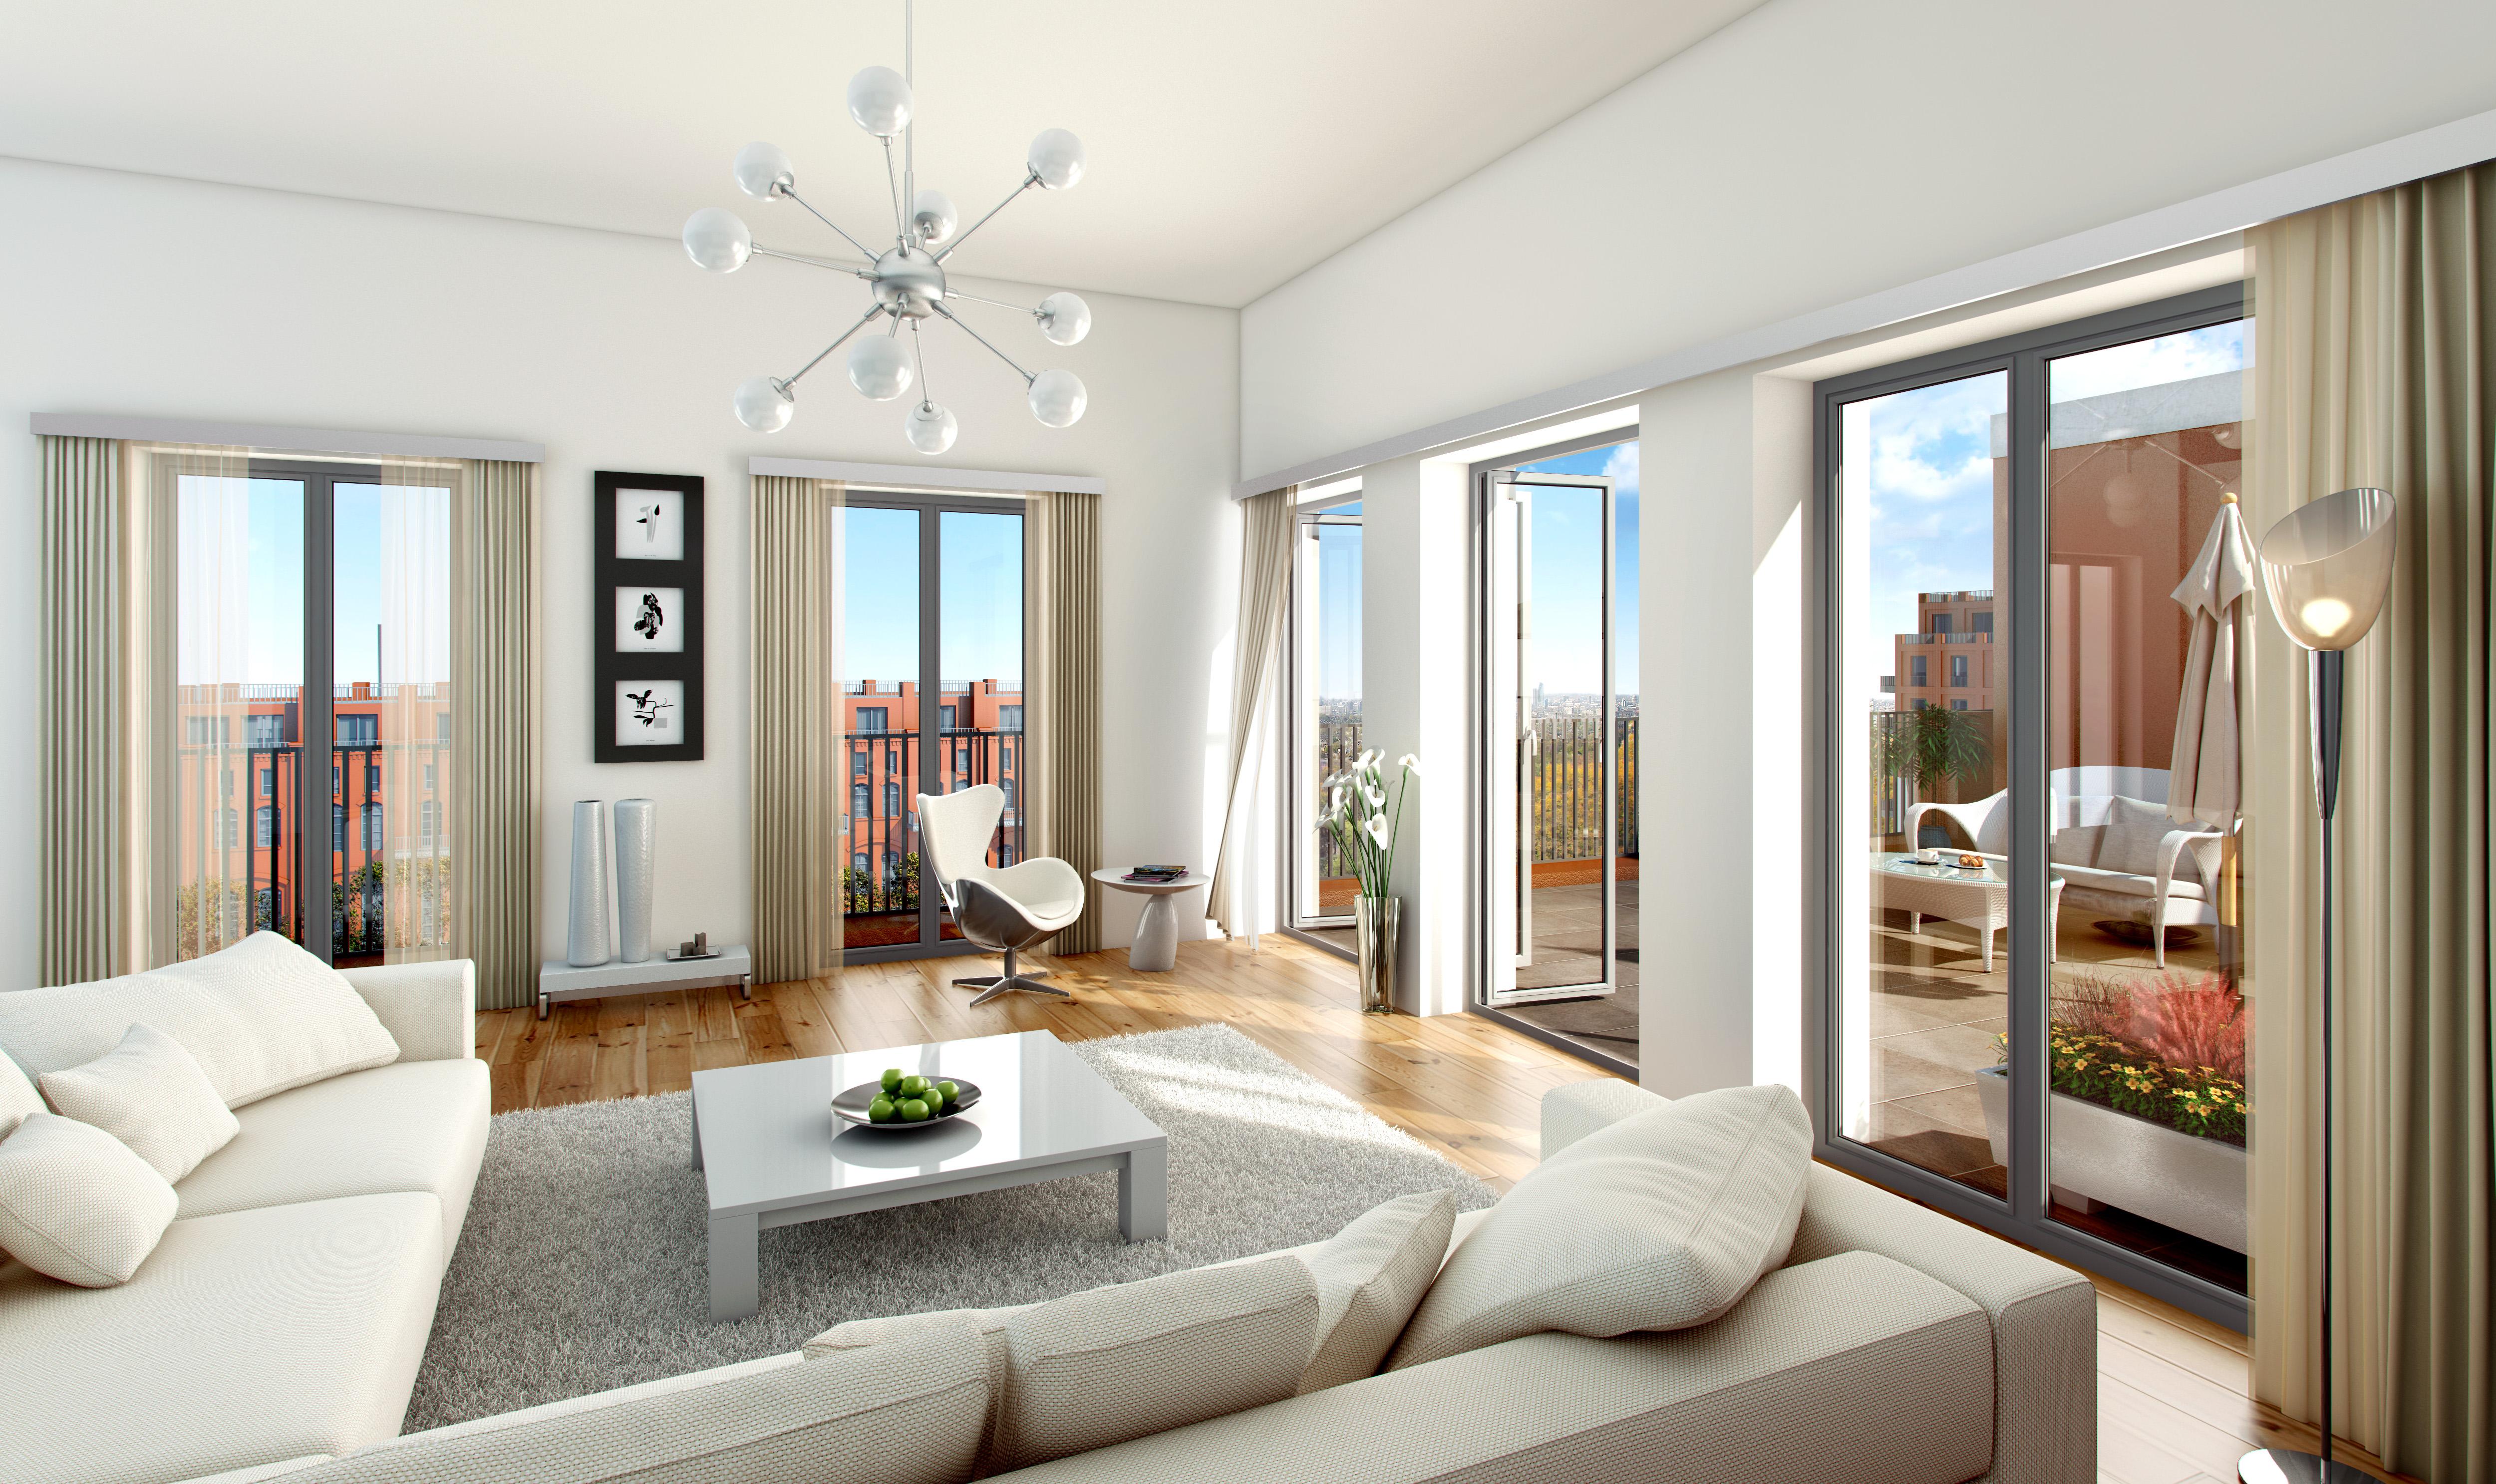 Penthouse Wohnung Berlin: Babelsbergerno̱1. Plenum download. .